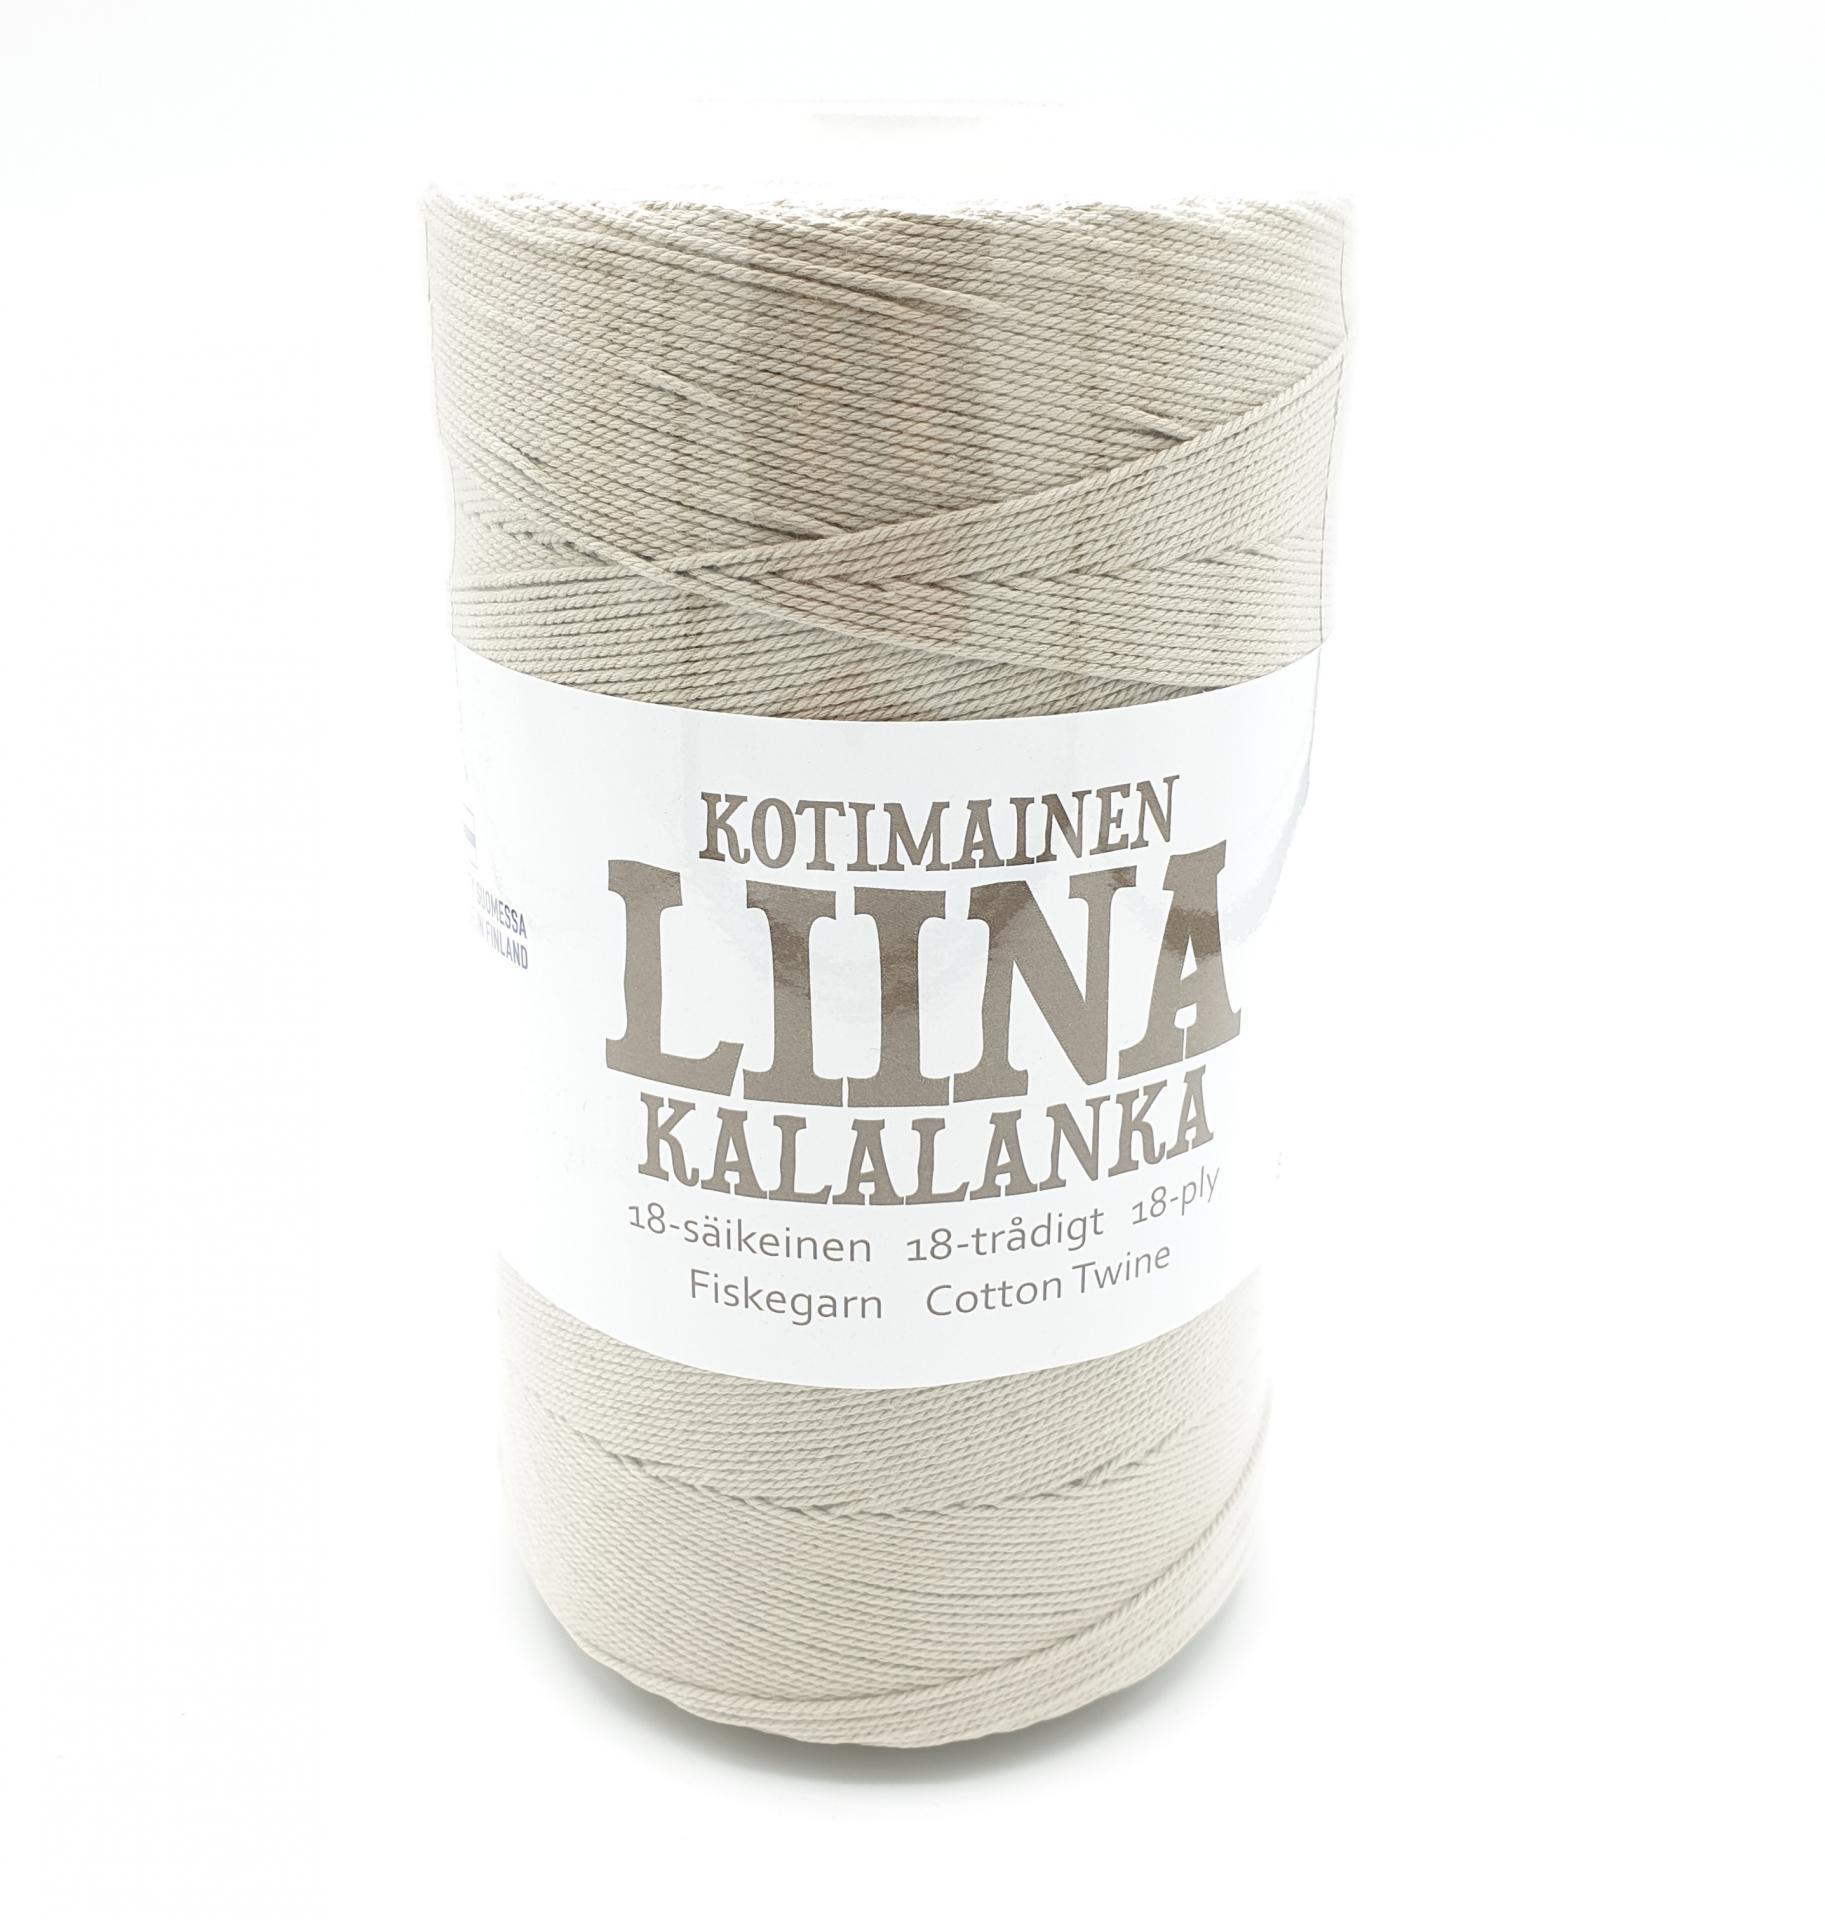 Cono algodón - Liina Kalalanka - Molla Mills - Piedra